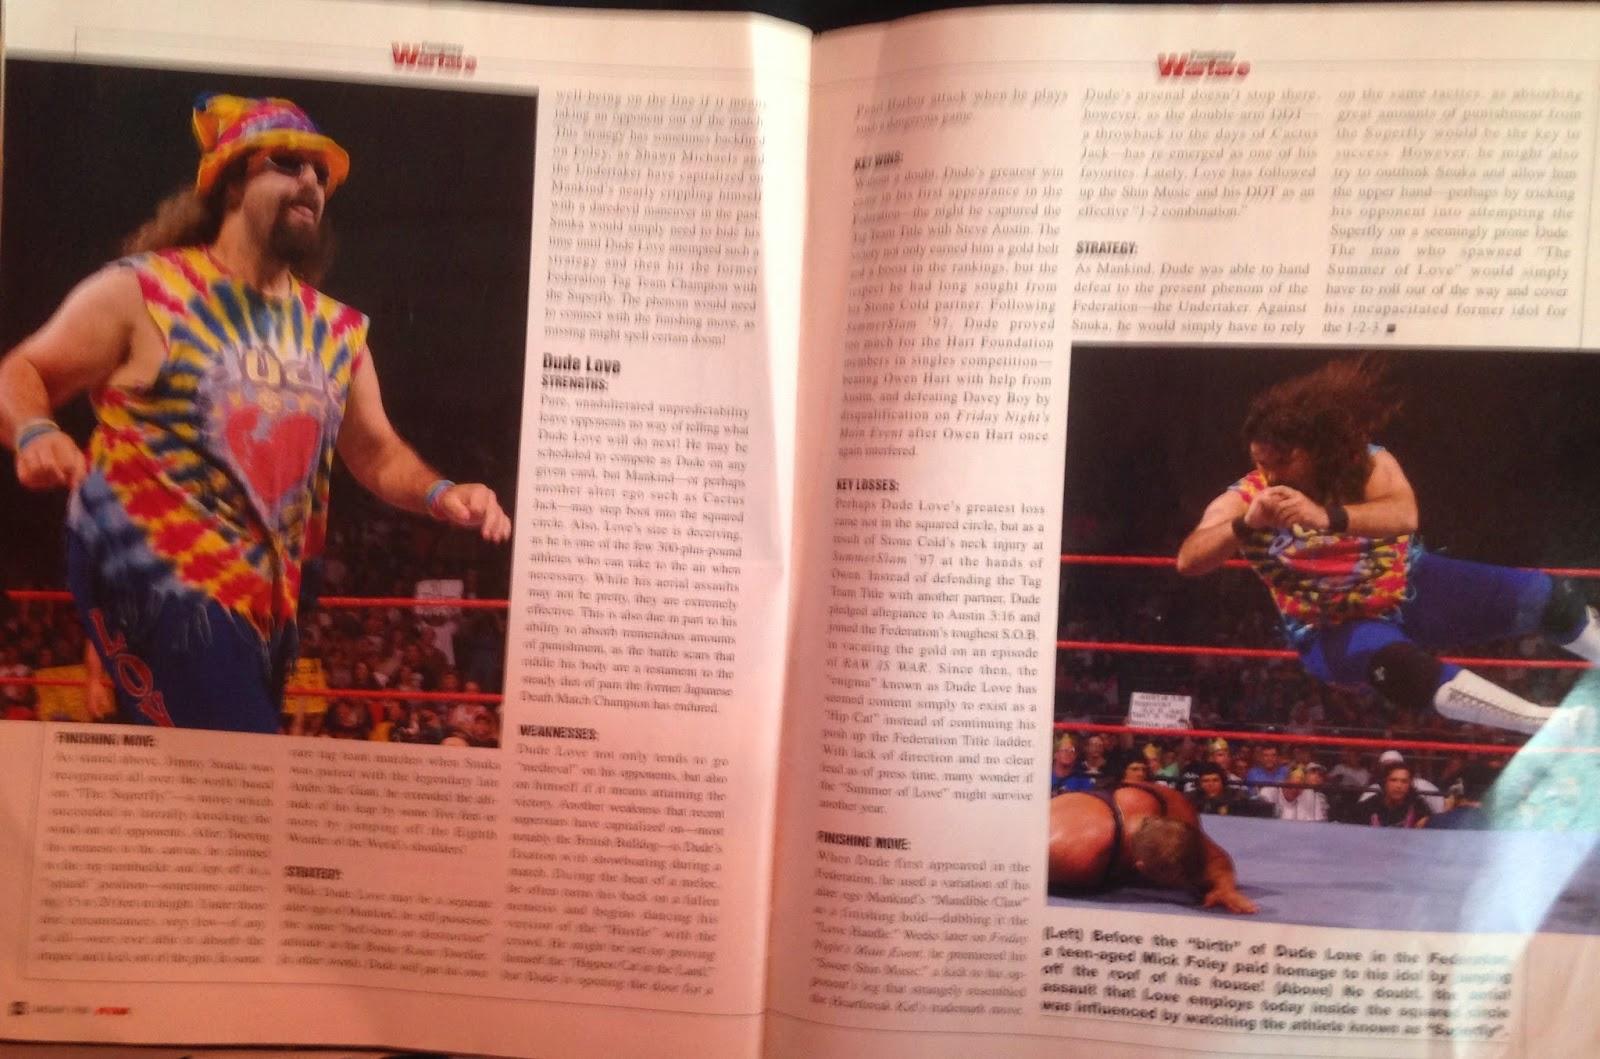 WWE: WWF RAW MAGAZINE - January 1998 - More Dude Love vs. Jimmy Snuka fantasy warfare